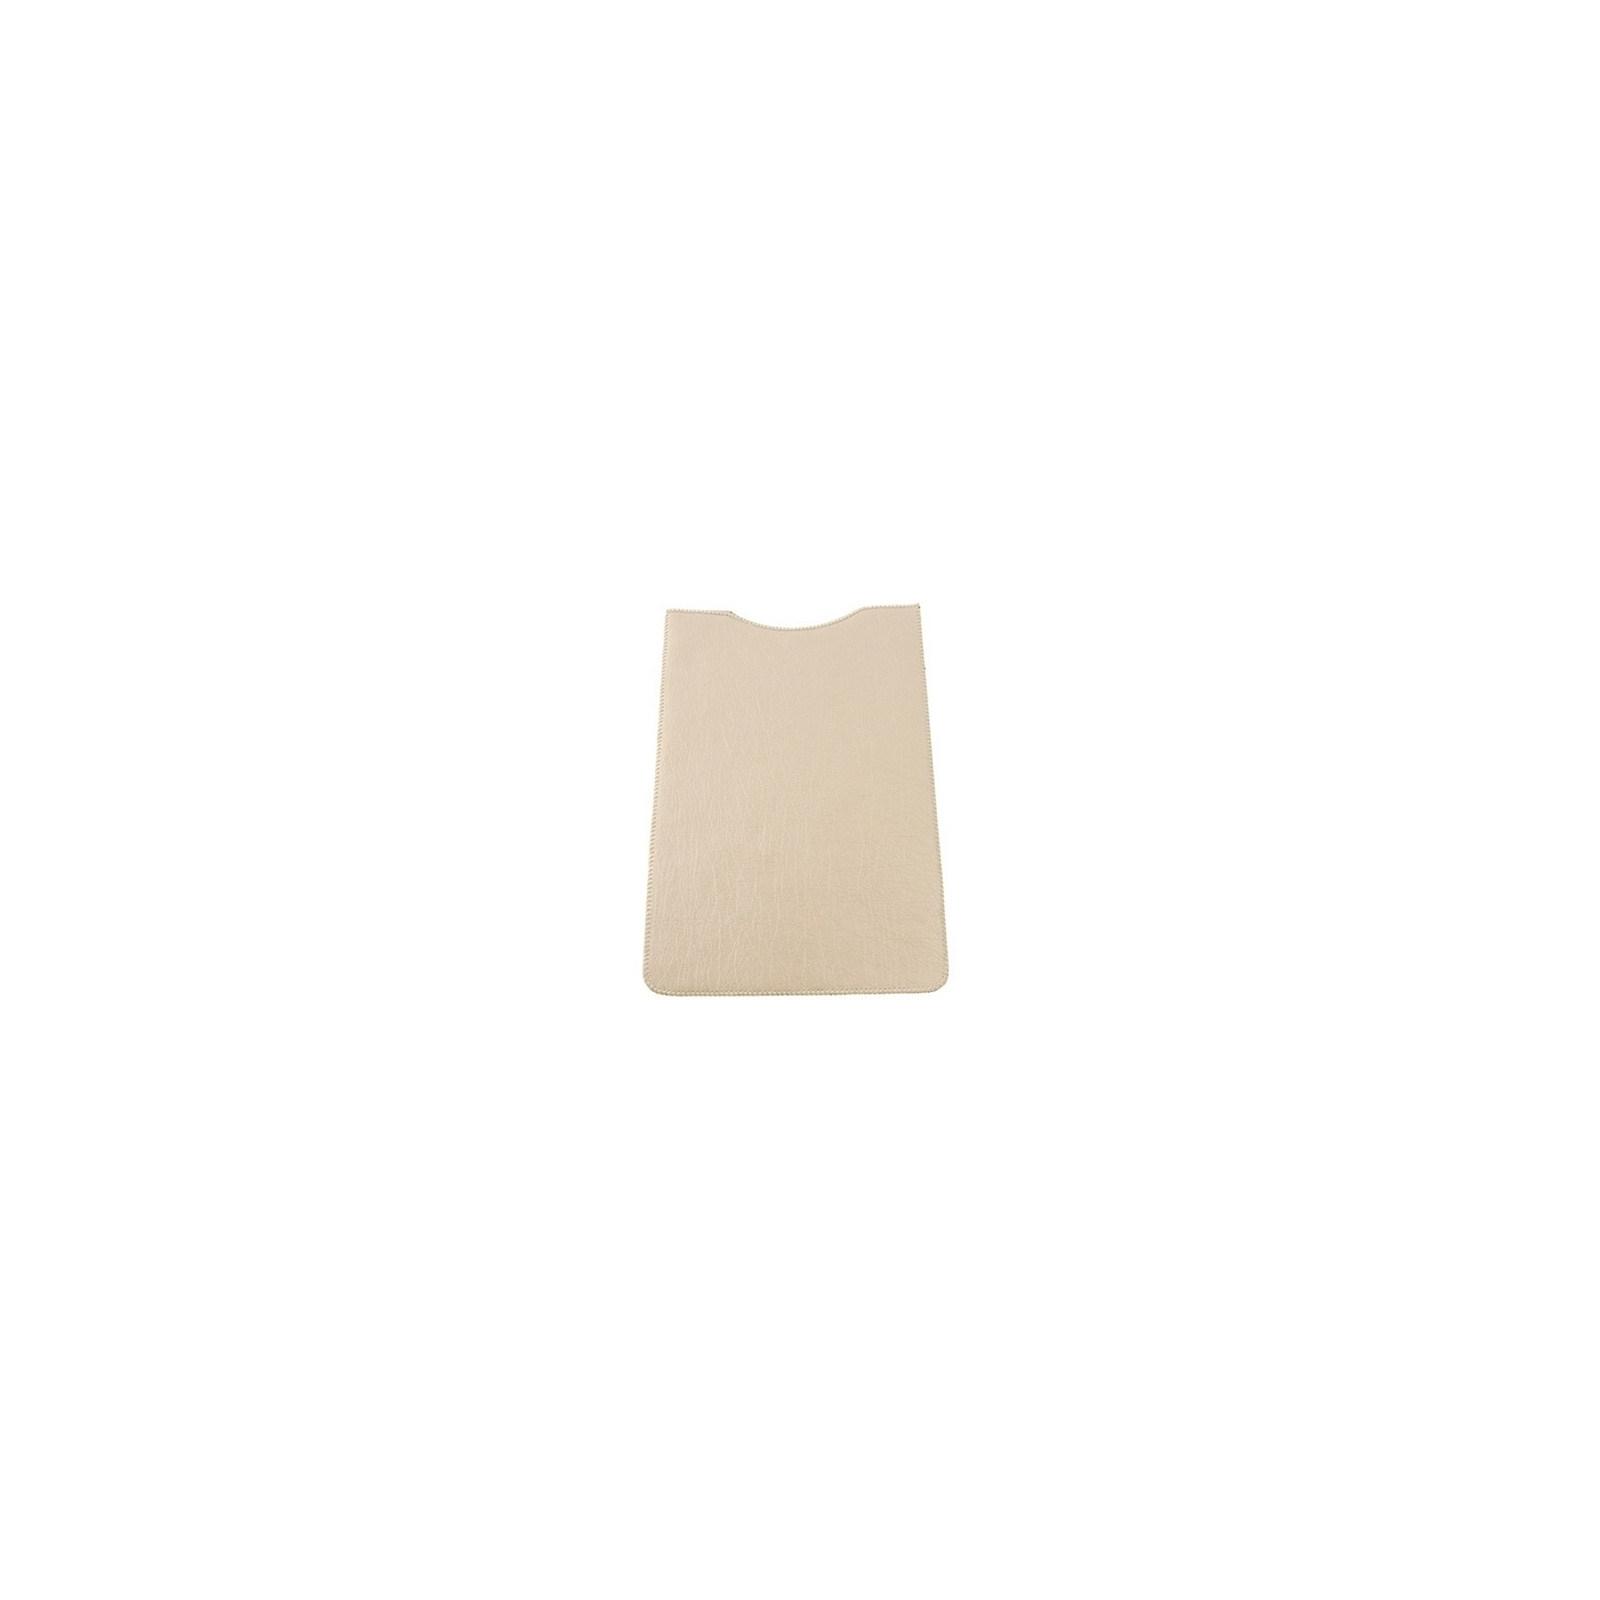 Чехол для планшета Drobak 7 Universal/Smooth Case/White (216810)